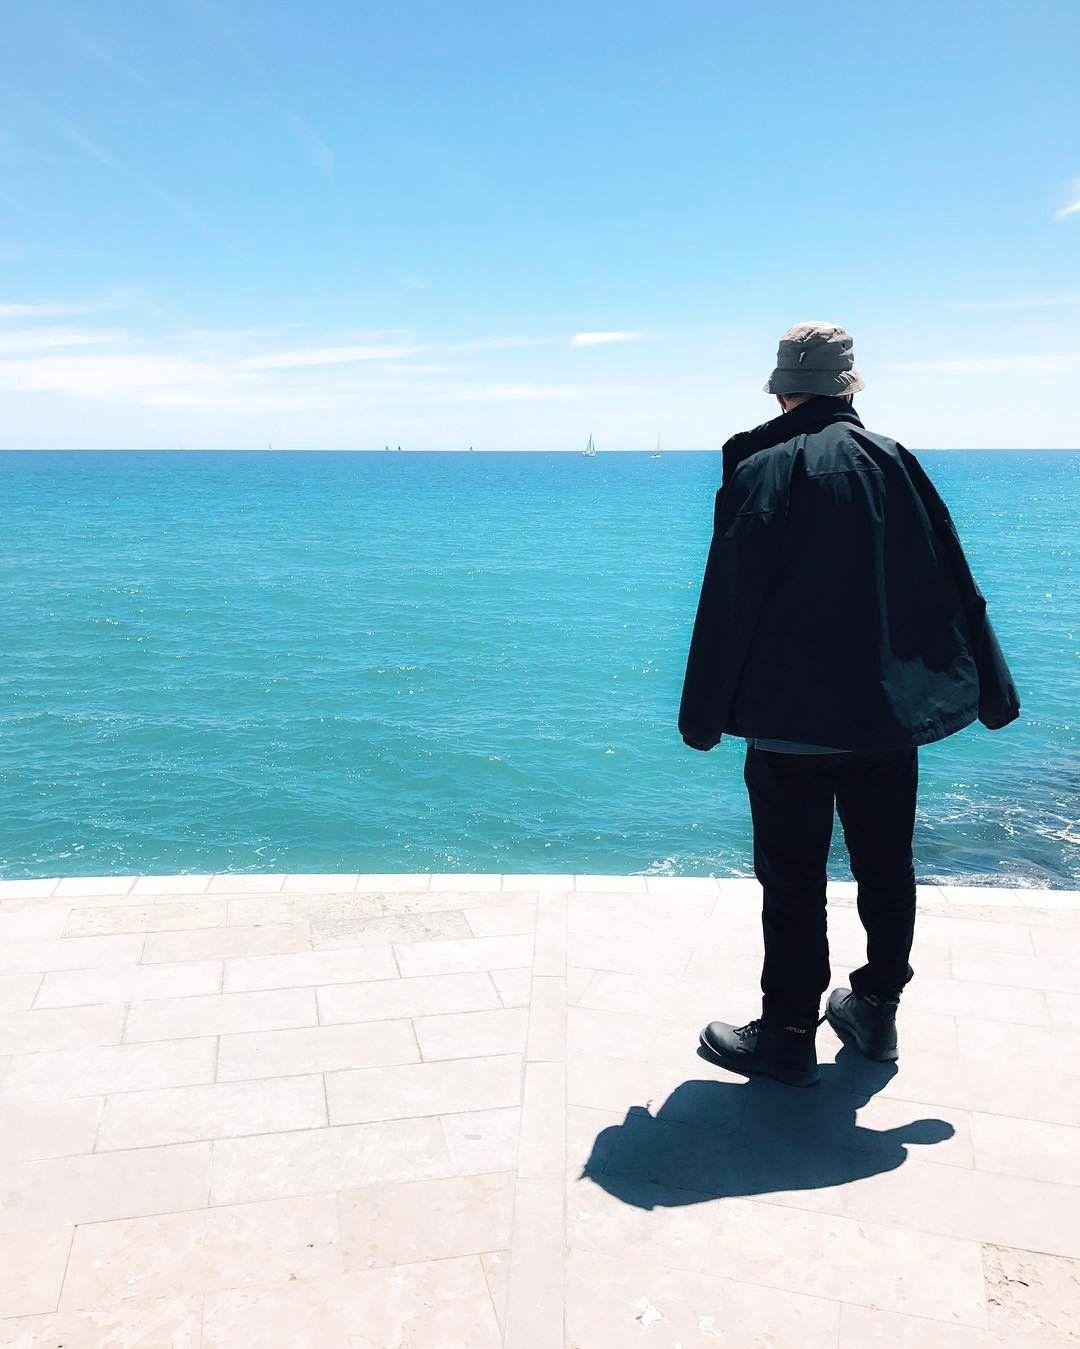 Dreaming about that Blue . . . #descobreixcatalunya #ig_barcelona #ig_catalonia  #catalunyagrafias #primerolacomunidad #communityfirst #hallazgosemanal #instagramEs #catalunyaexperience #instantes_gf #fotomovil_es #fotonline_es #visitbarcelona #instaghesboro #ig_worldclub #igrecommend #artofvisual #agameoftones #lumixandme #Sitges